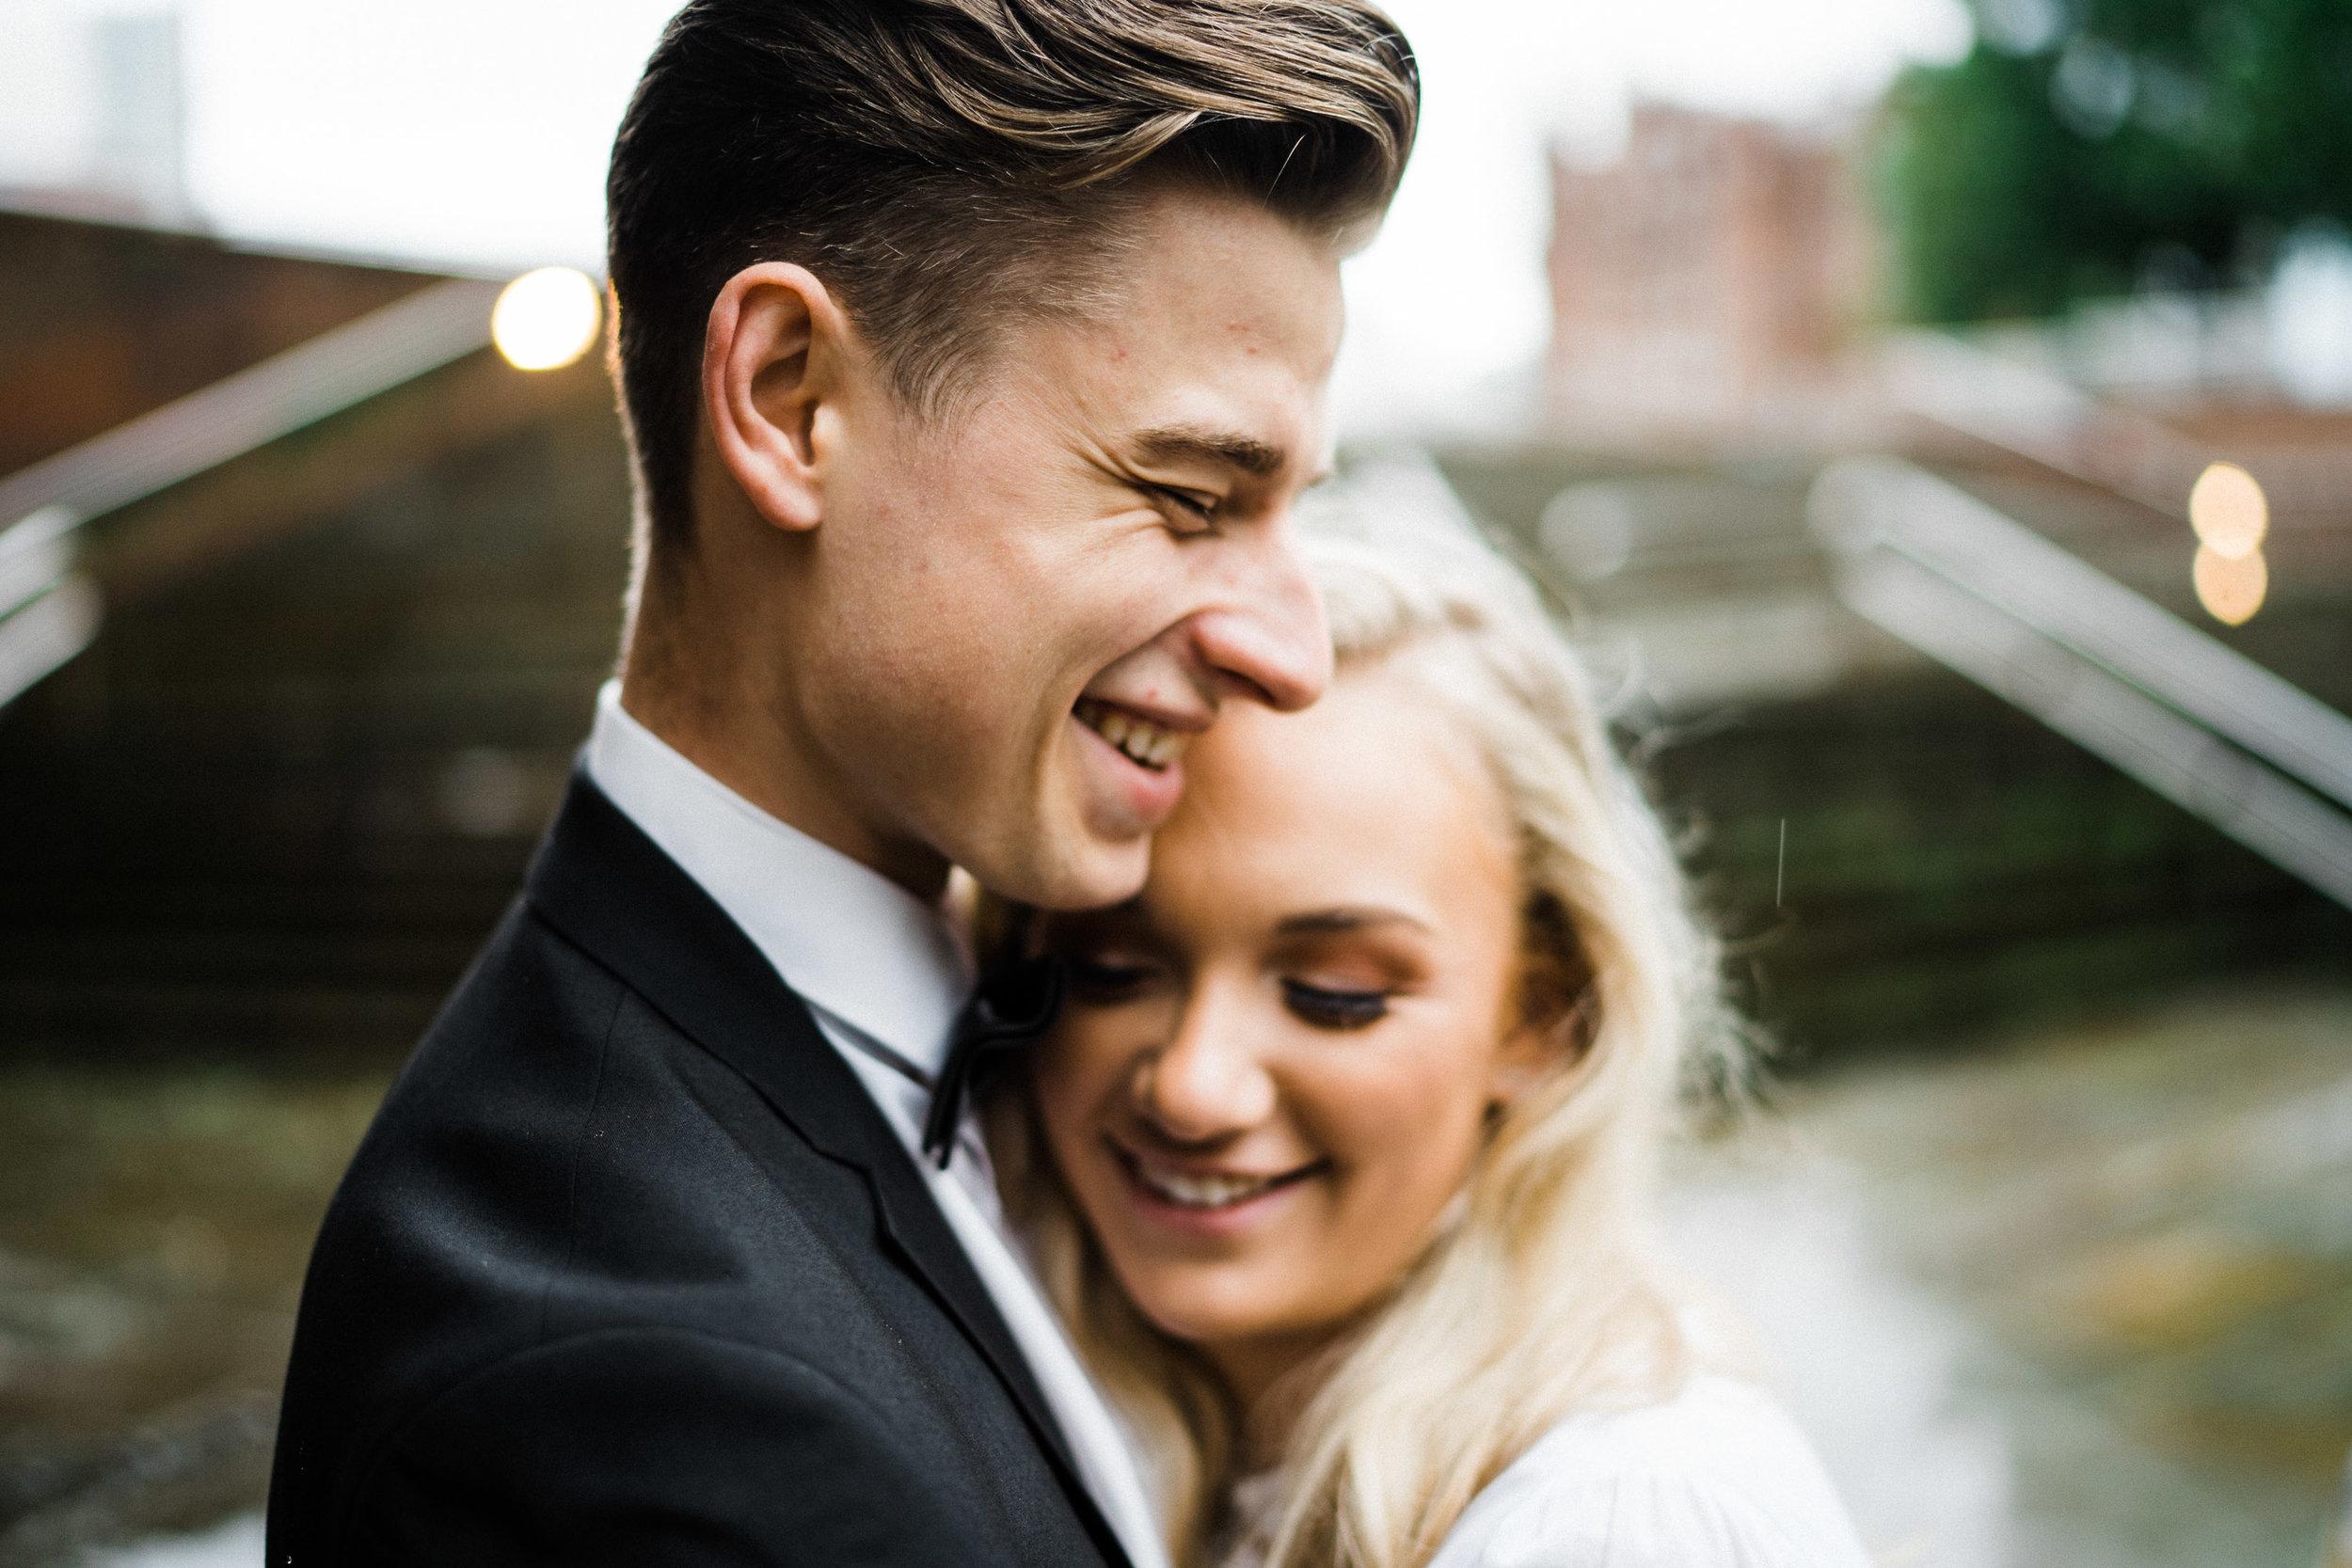 www.bytomw.com - Tom Wright - Manchester & Lake District Wedding Photographer -01014.jpg